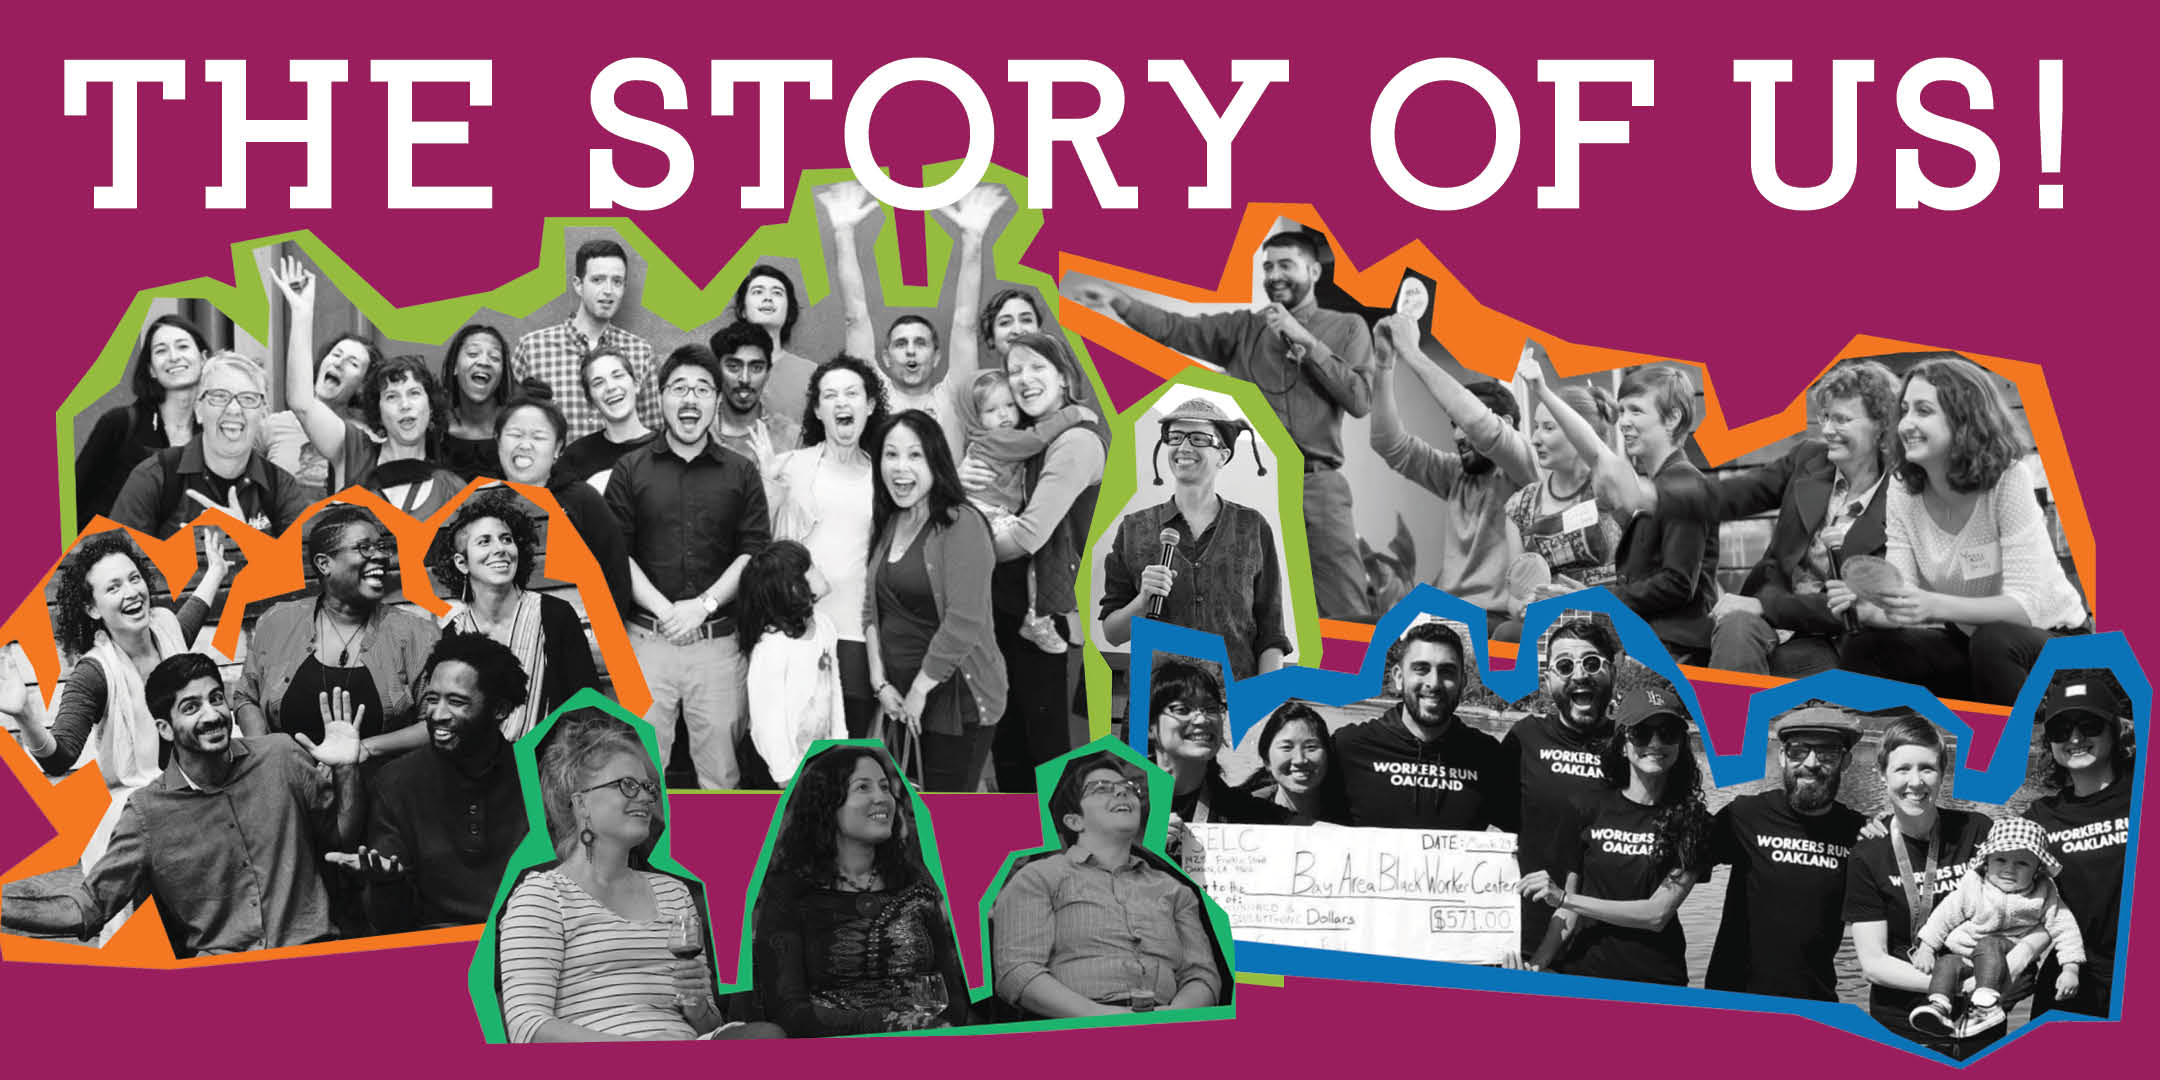 Is the story of you, the story of me, the story of us!